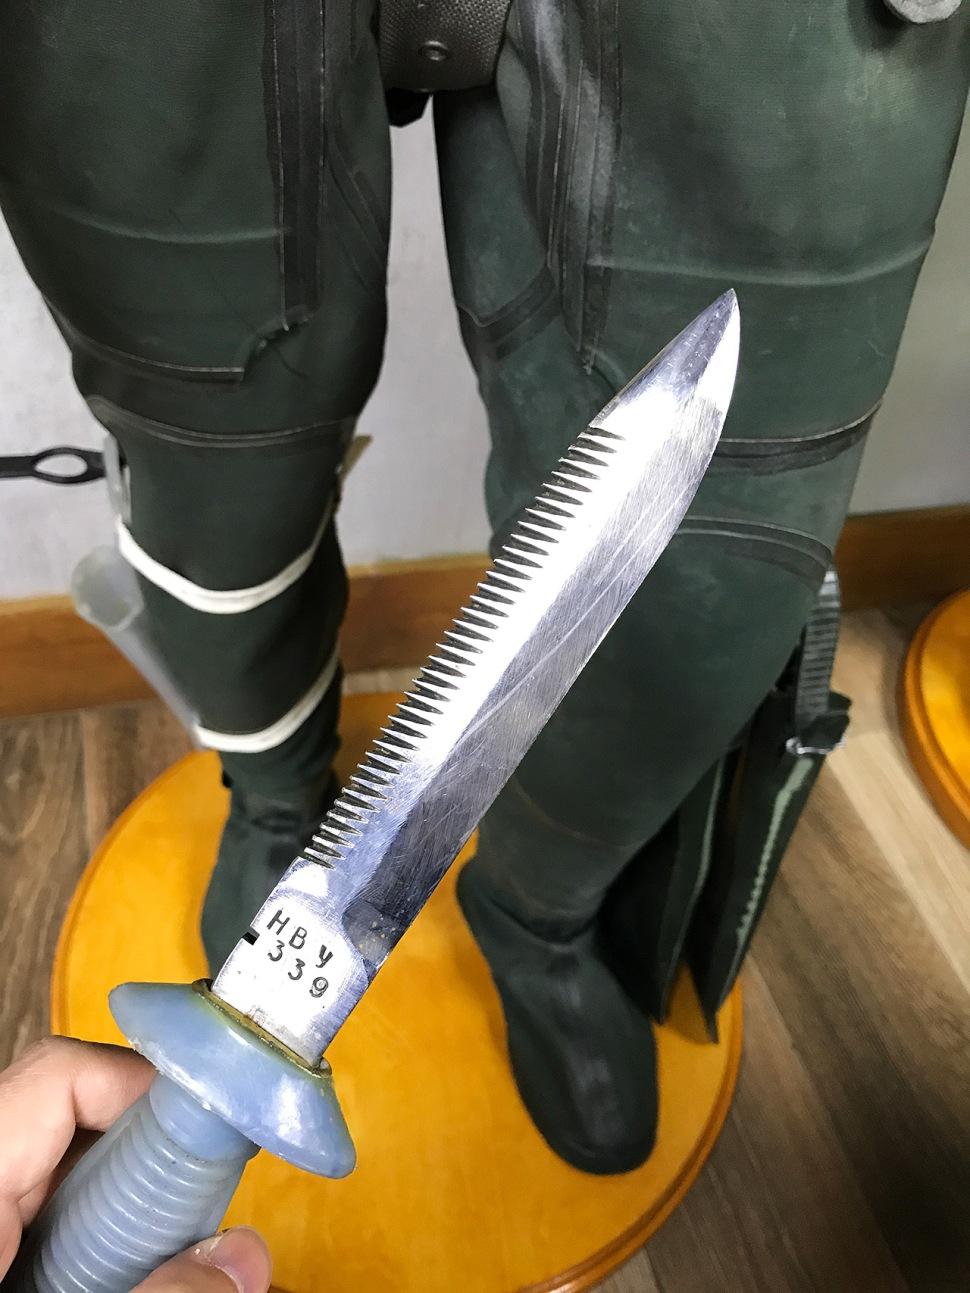 180628-panerai-gtg-moscow-paneristi-club-room-rebreather-IDA-71-knife